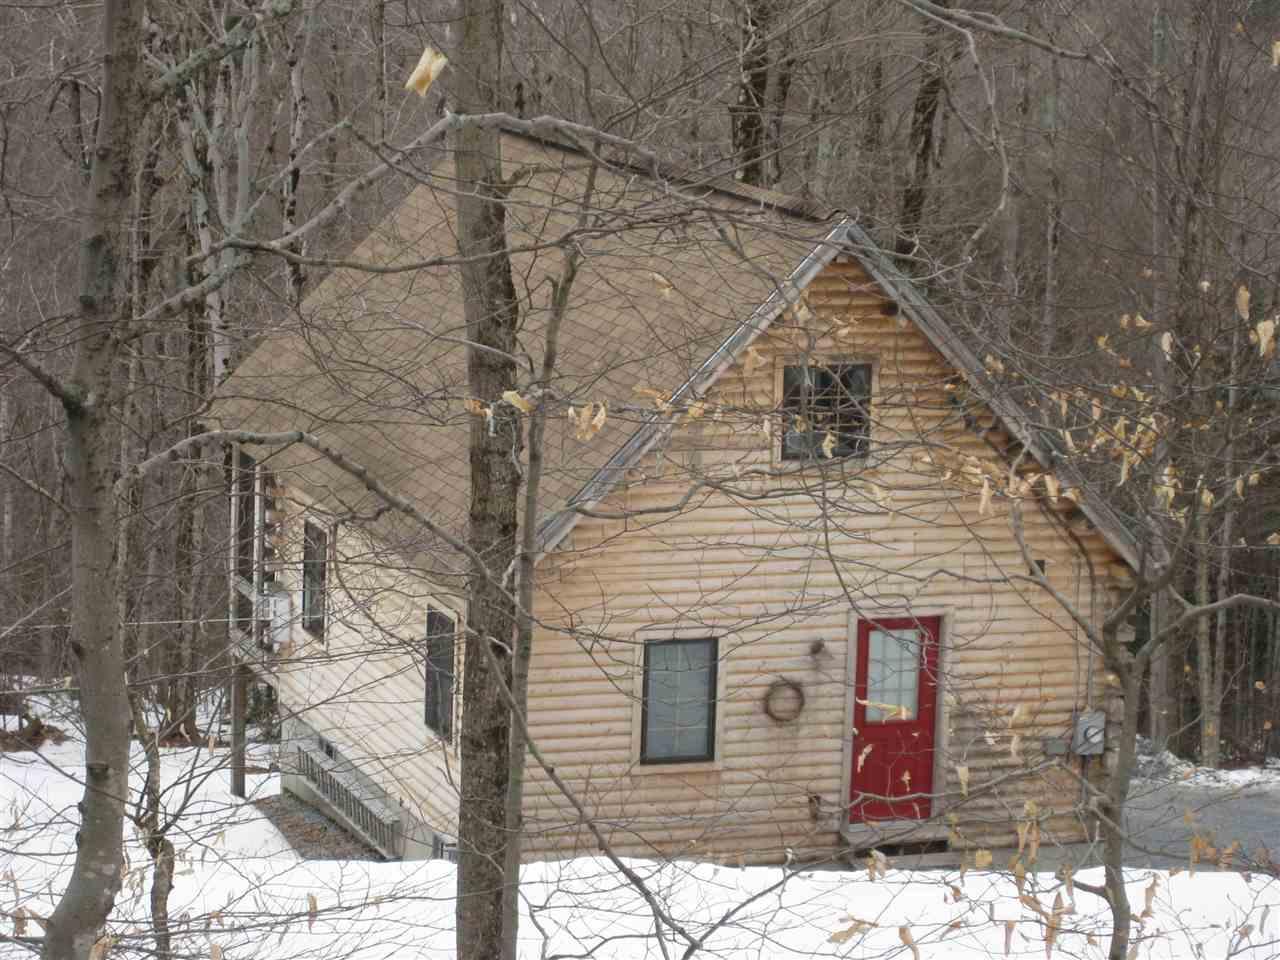 Mount-Snow-Real-Estate-4623147-1